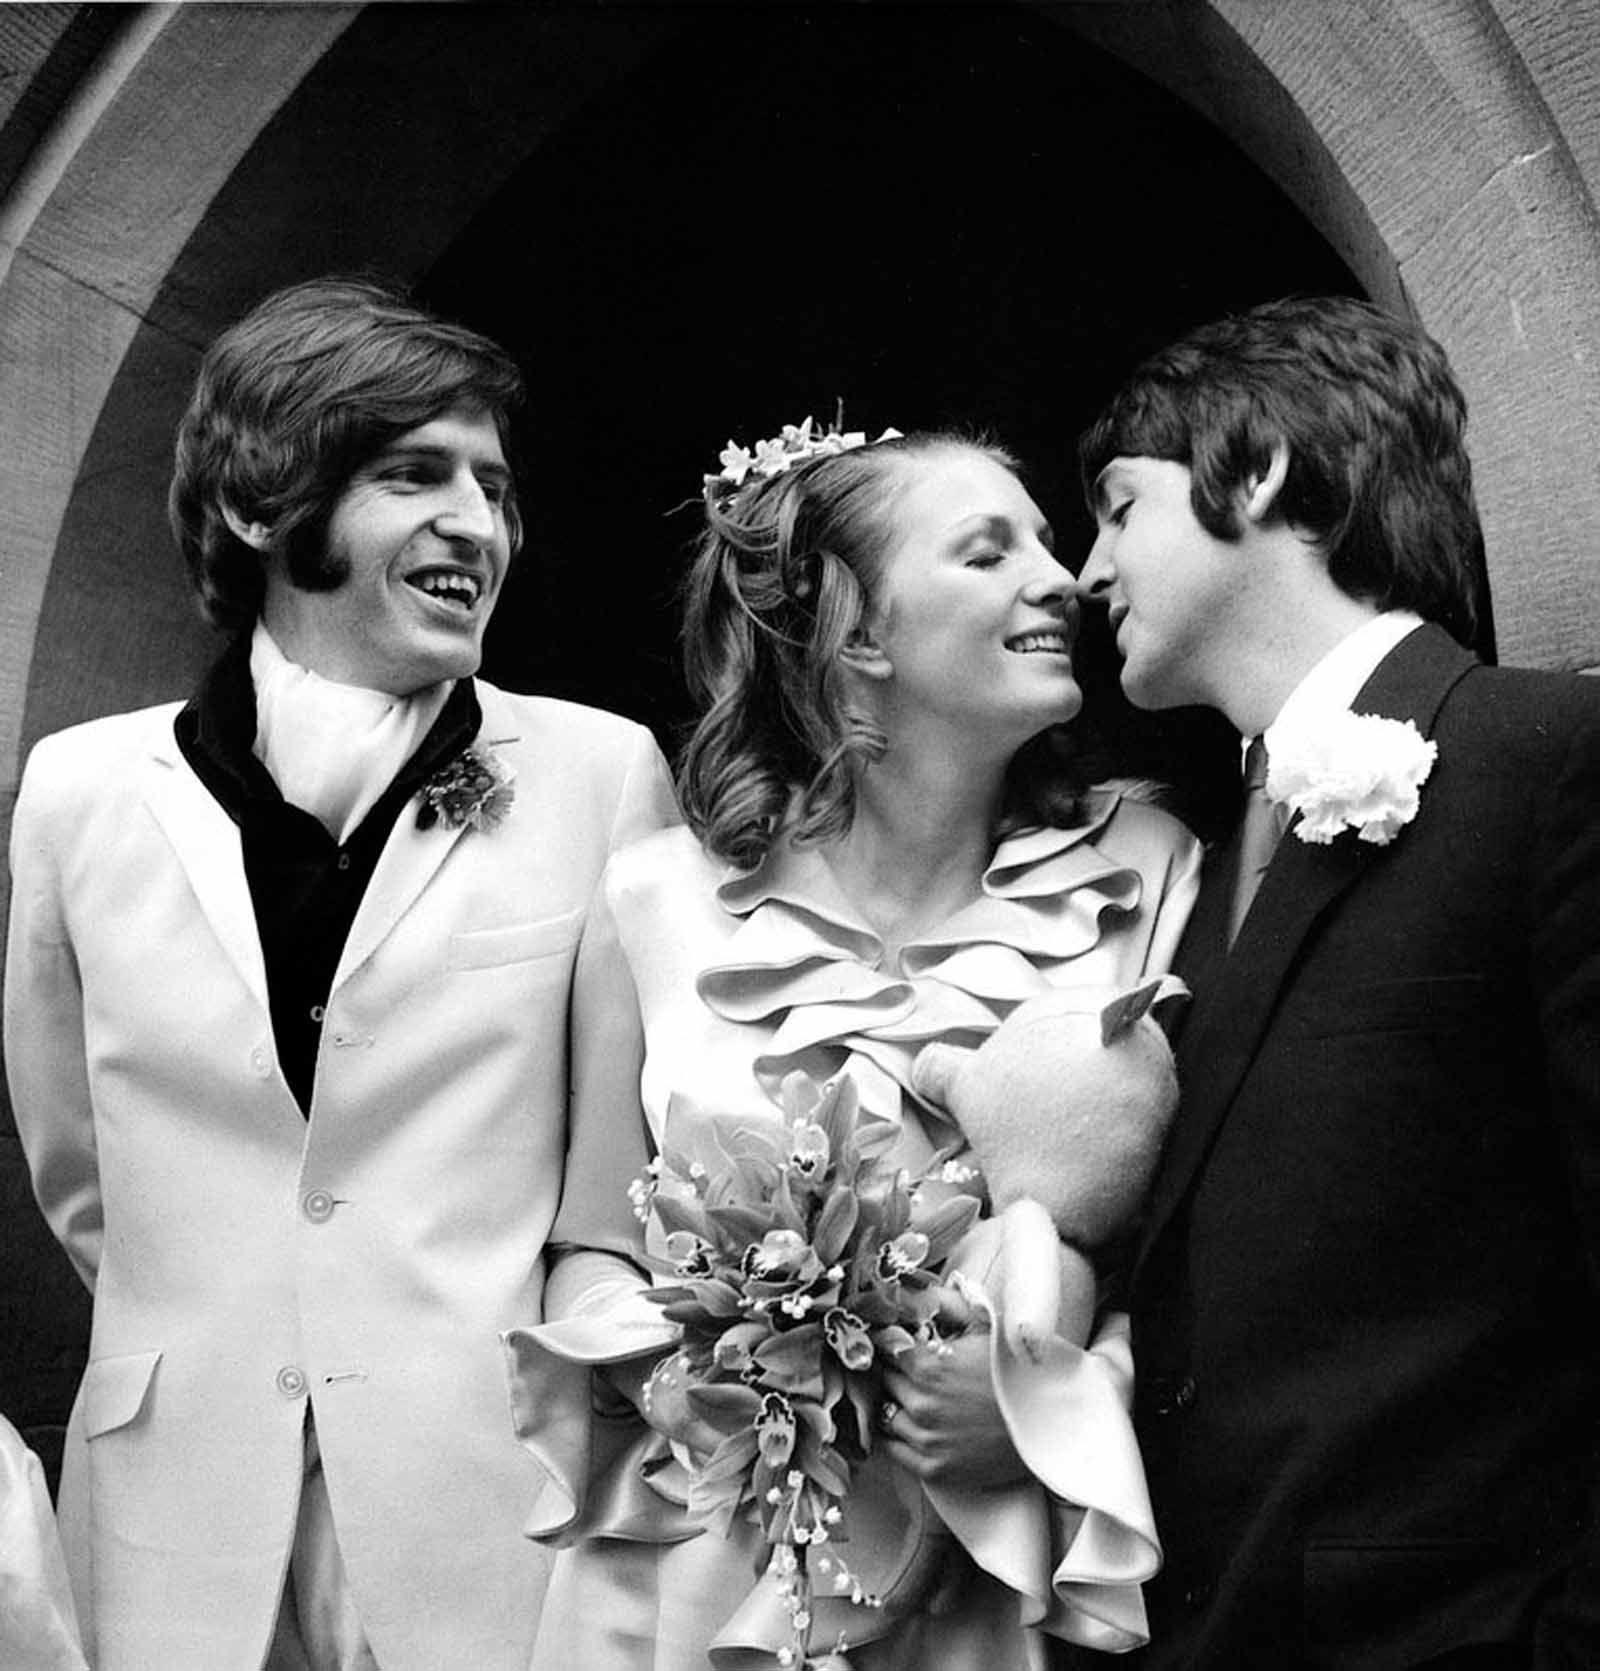 Paul Mccartney Kisses His New Sister In Law Angela Fishwick